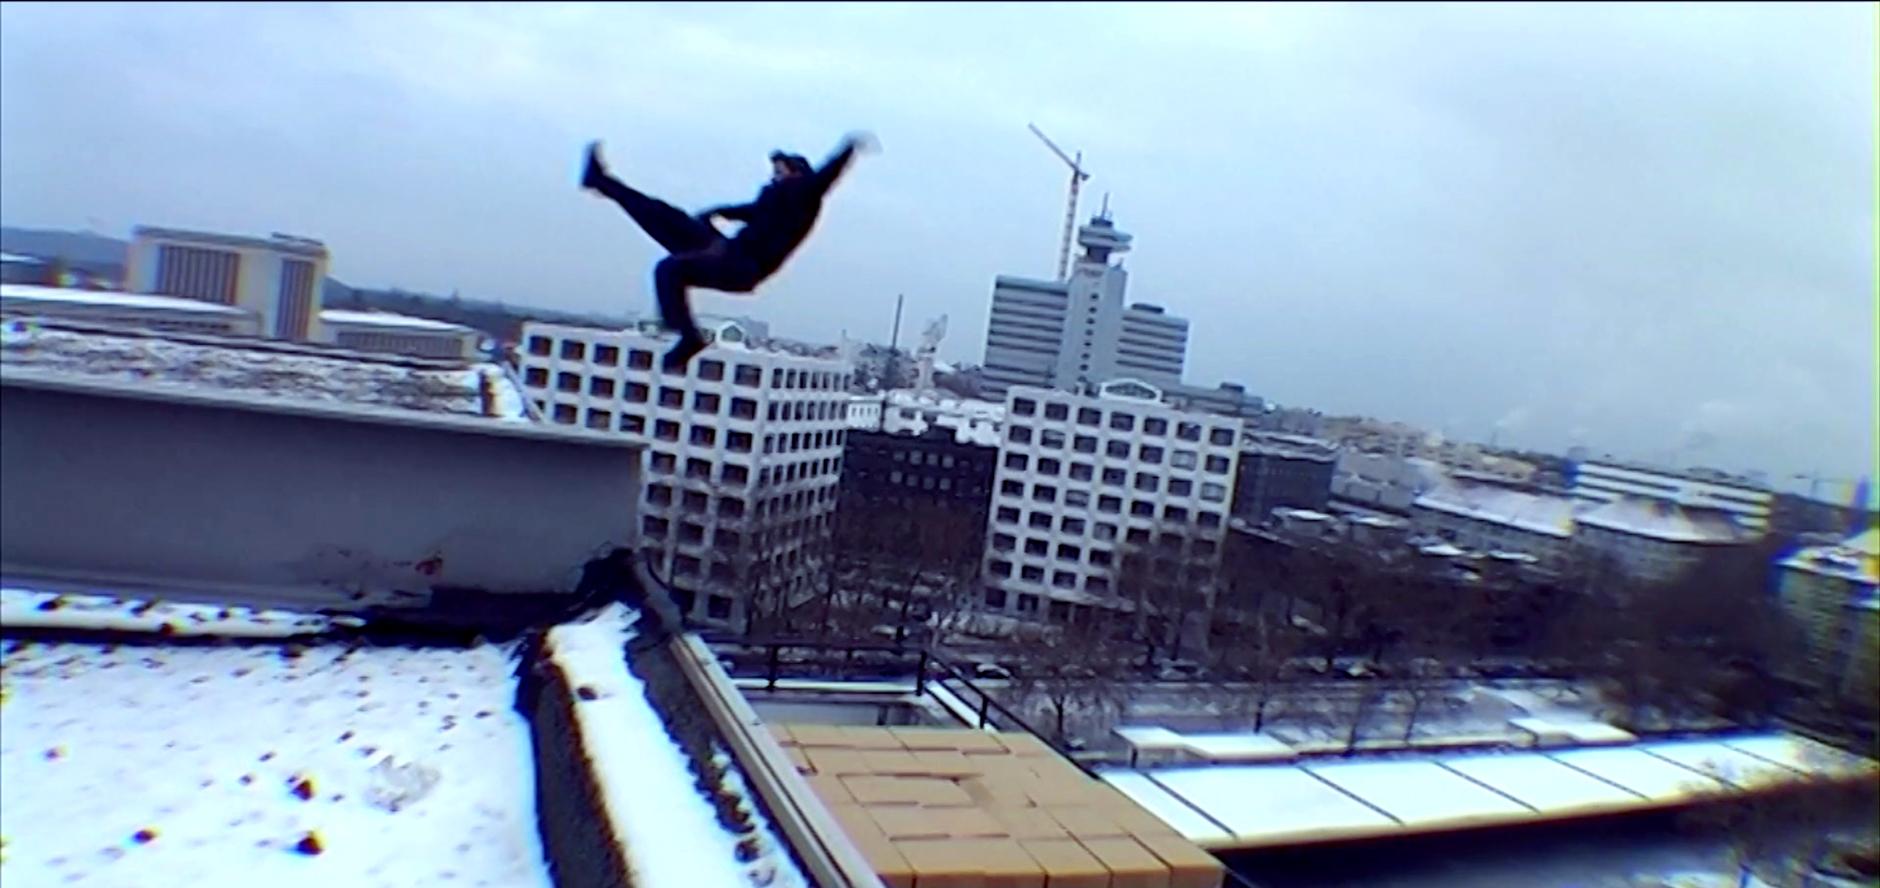 Martin Goeres, Highfall, Stunt, Action, Movie